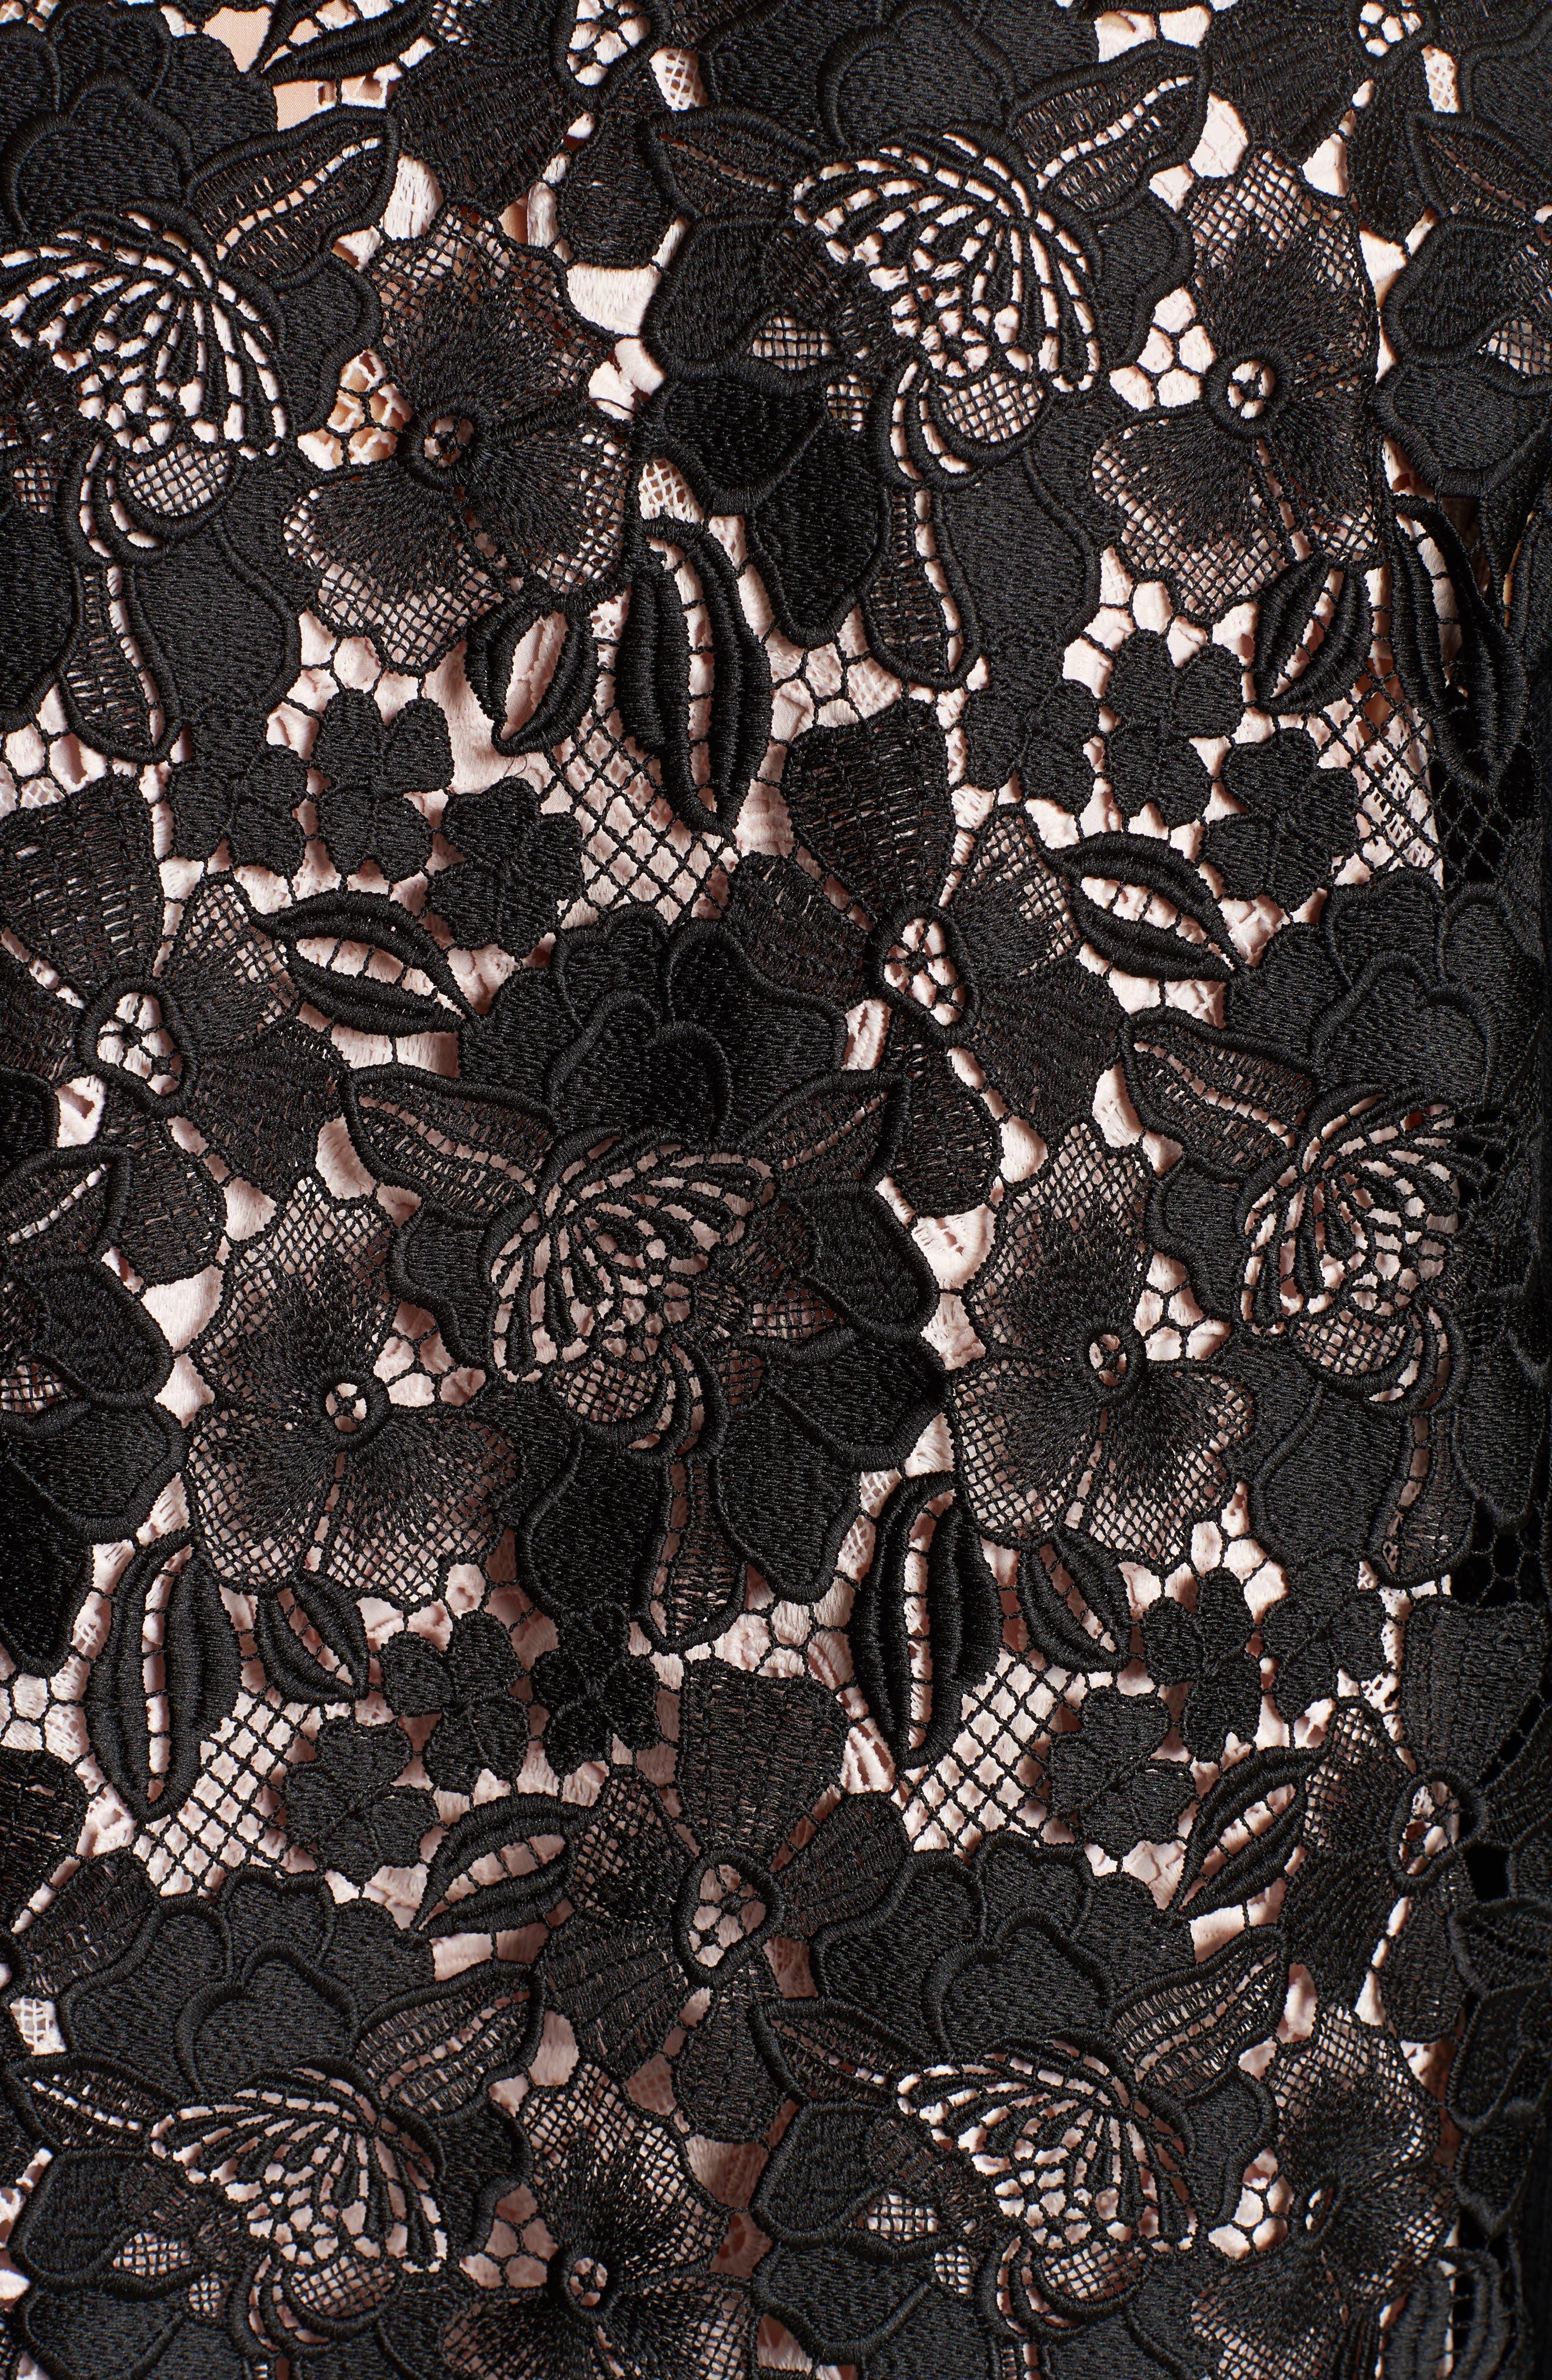 Lace Back Wool Blend Cardigan,                             Alternate thumbnail 5, color,                             001